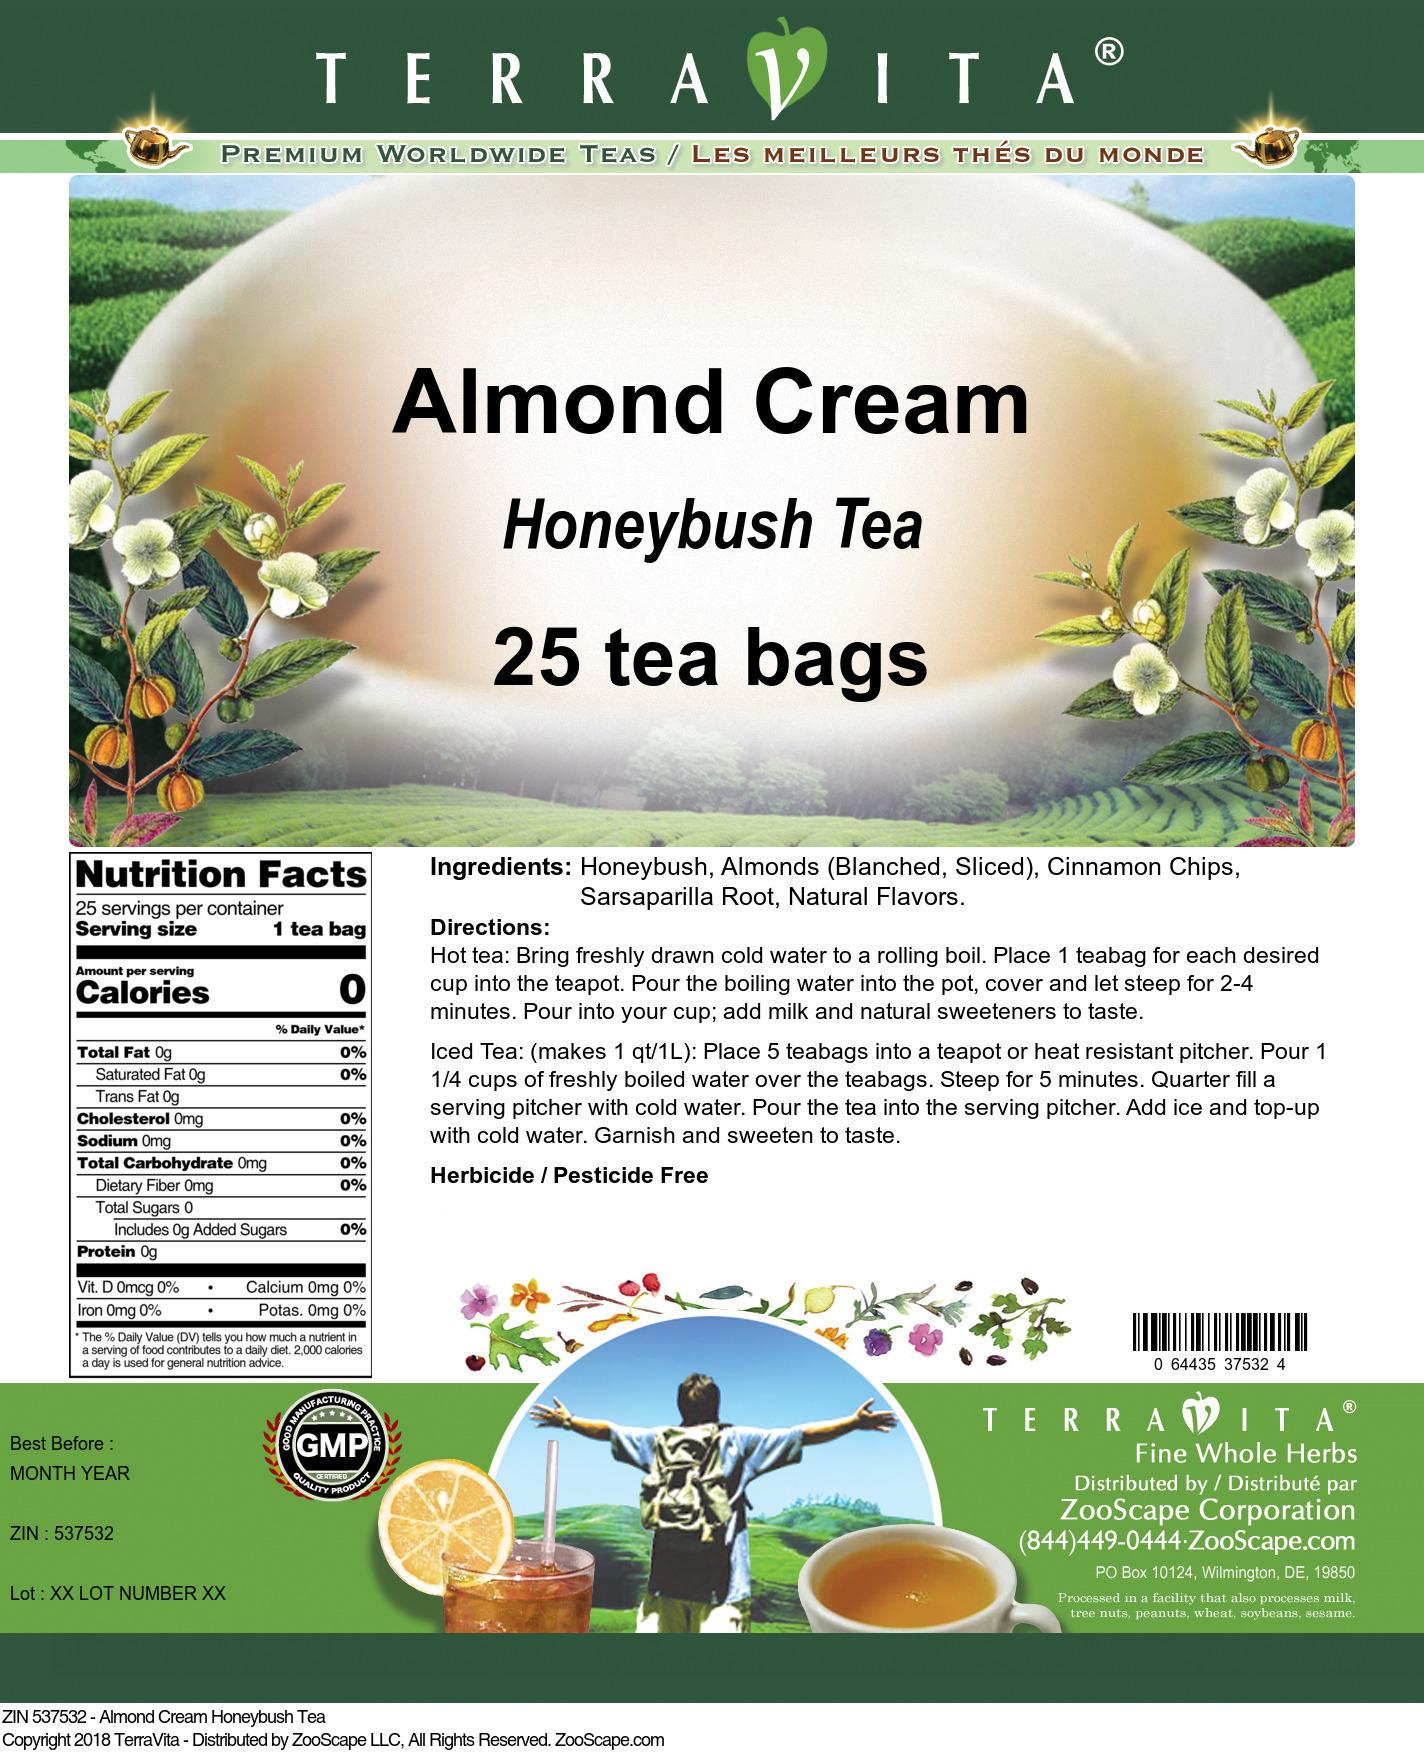 Almond Cream Honeybush Tea